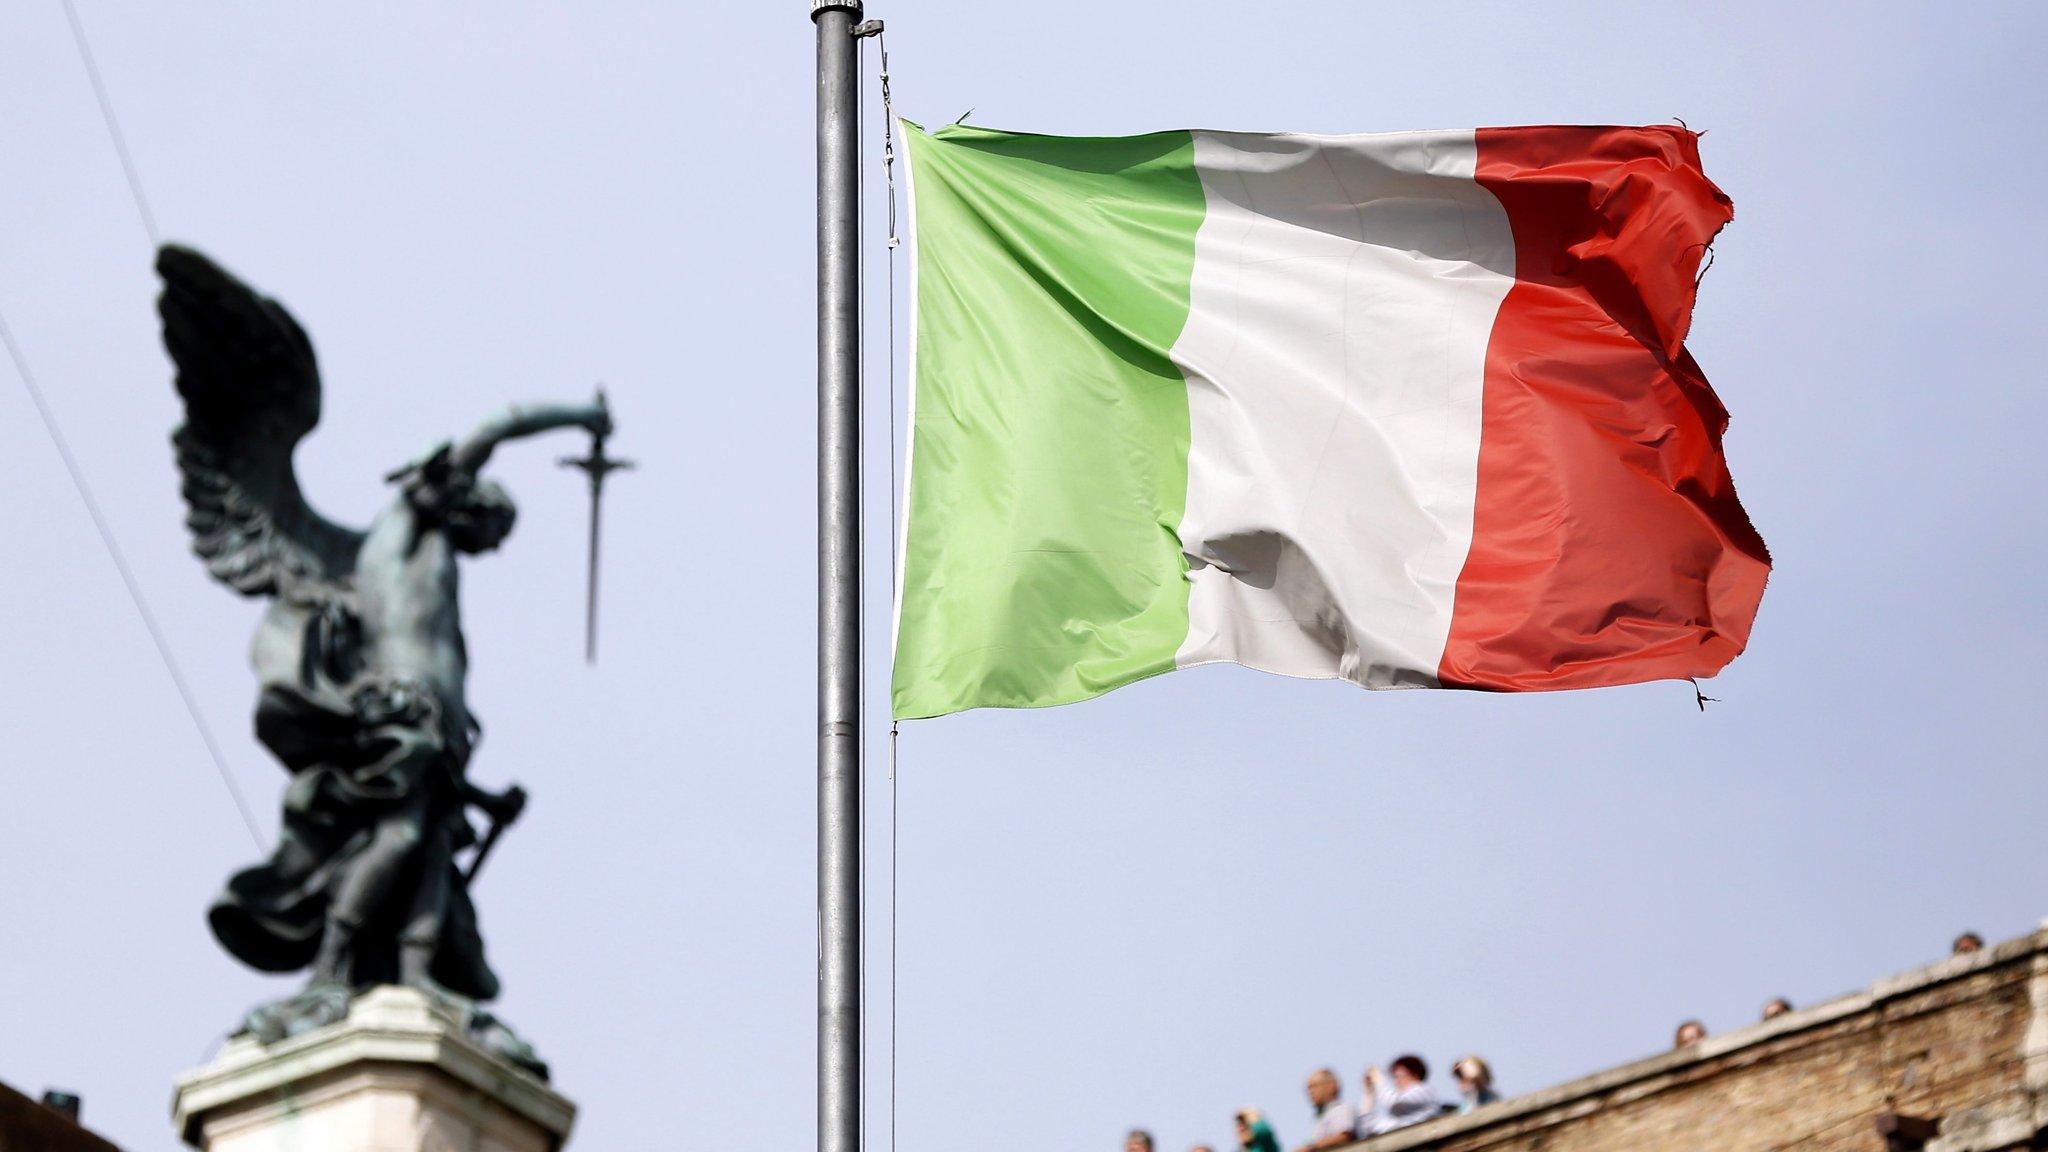 banche-italiane-crisi-mercati-borsa